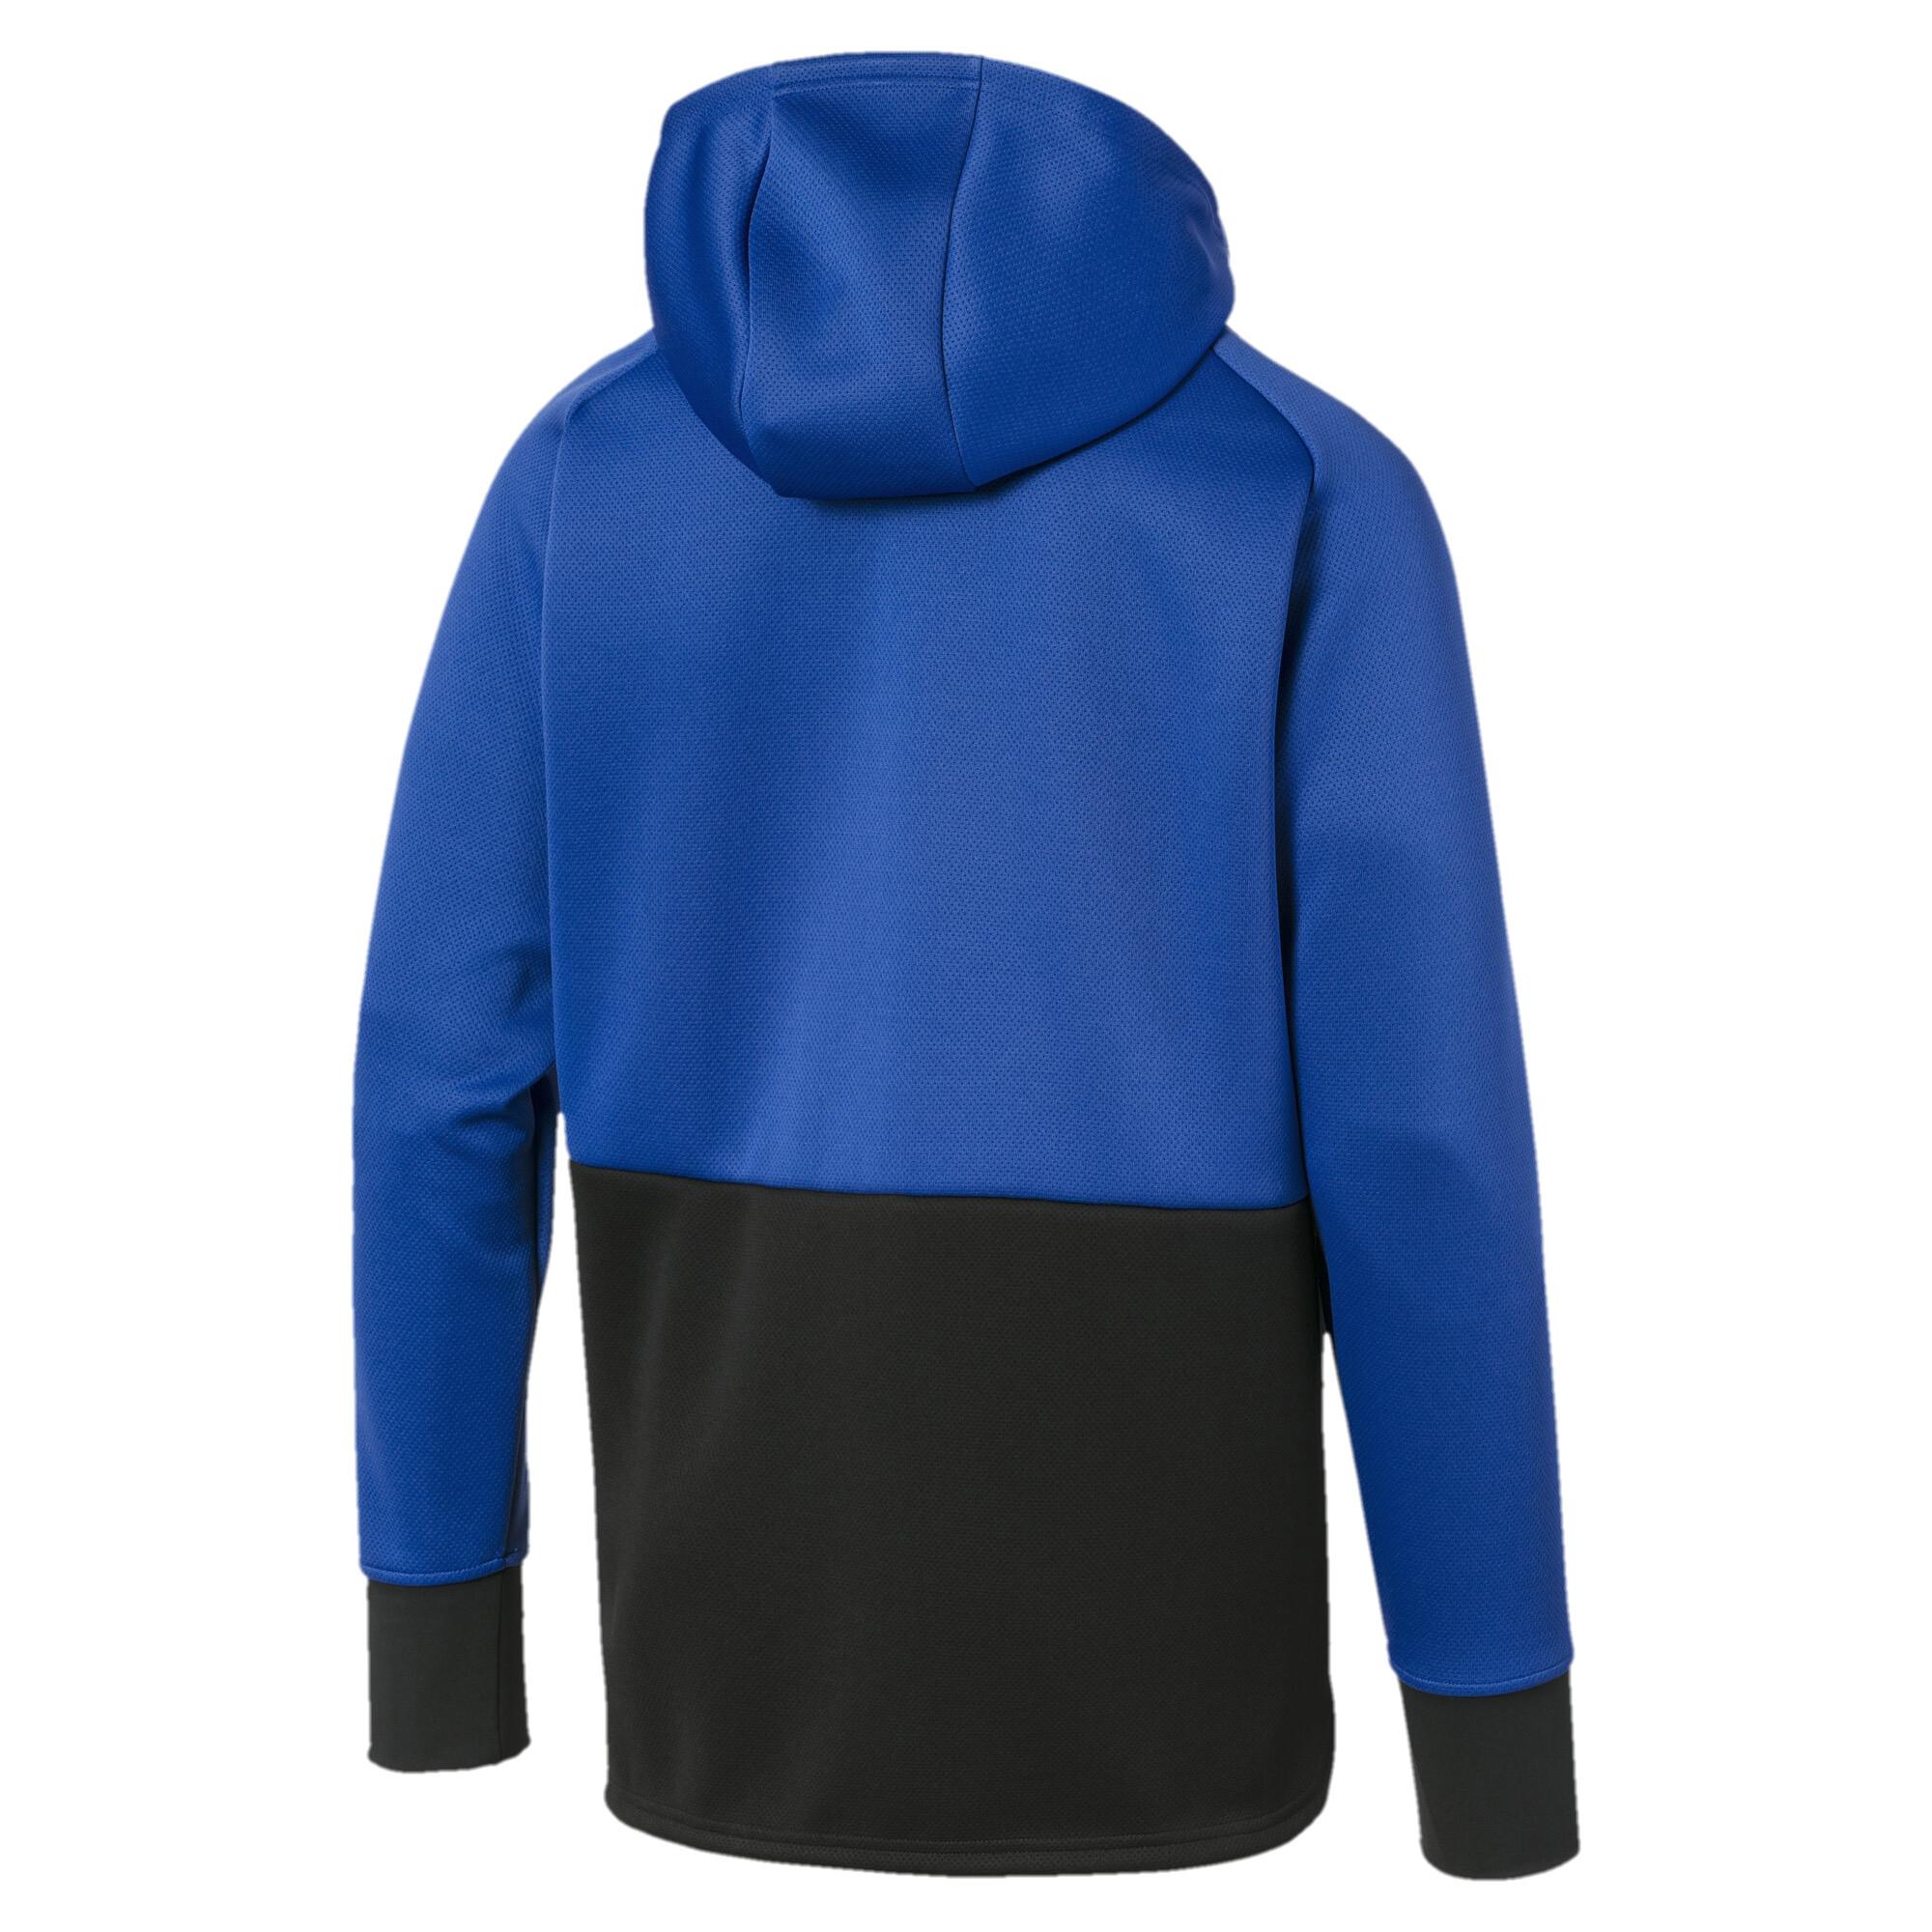 PUMA-Power-BND-Men-039-s-Jacket-Men-Knitted-Jacket-Training thumbnail 3